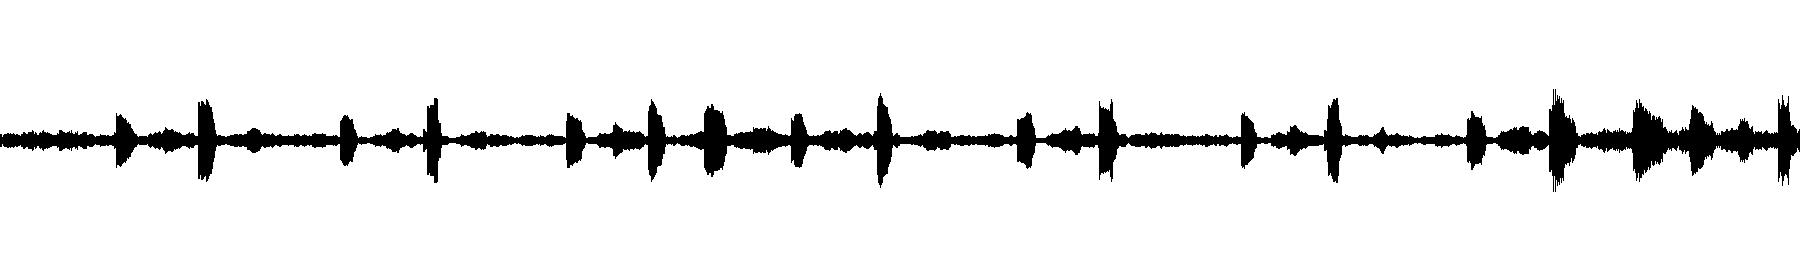 pth synth 14